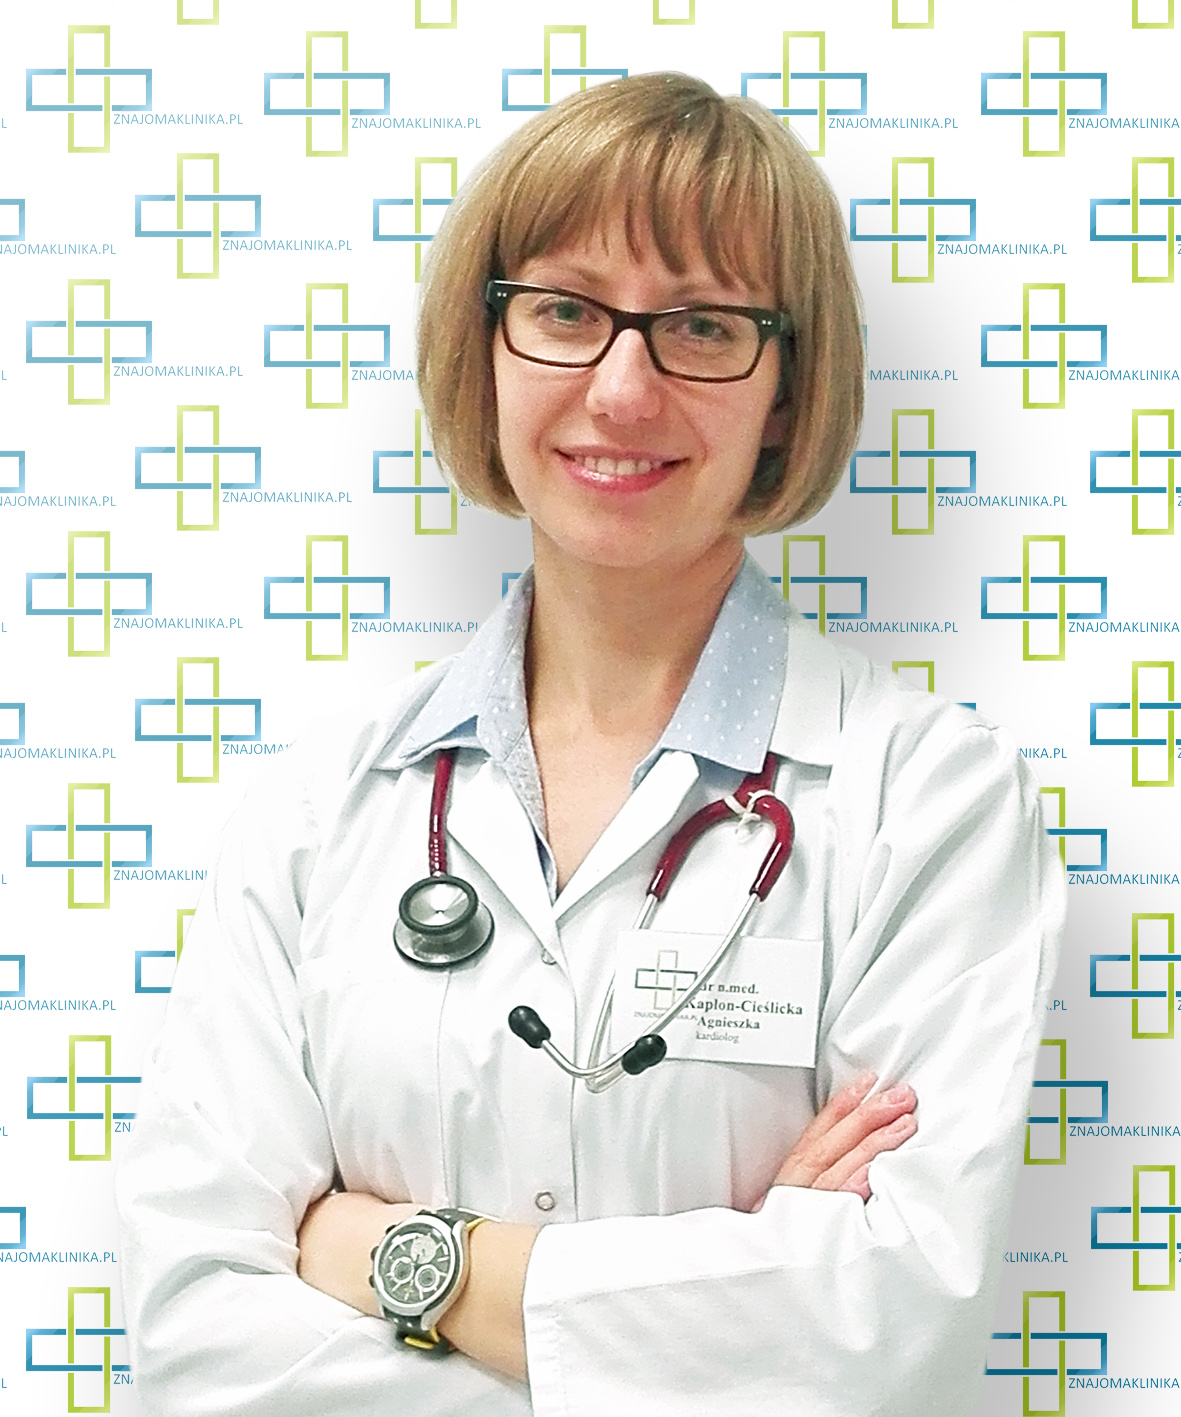 dr hab.n.med. Agnieszka Kapłon-Cieślicka